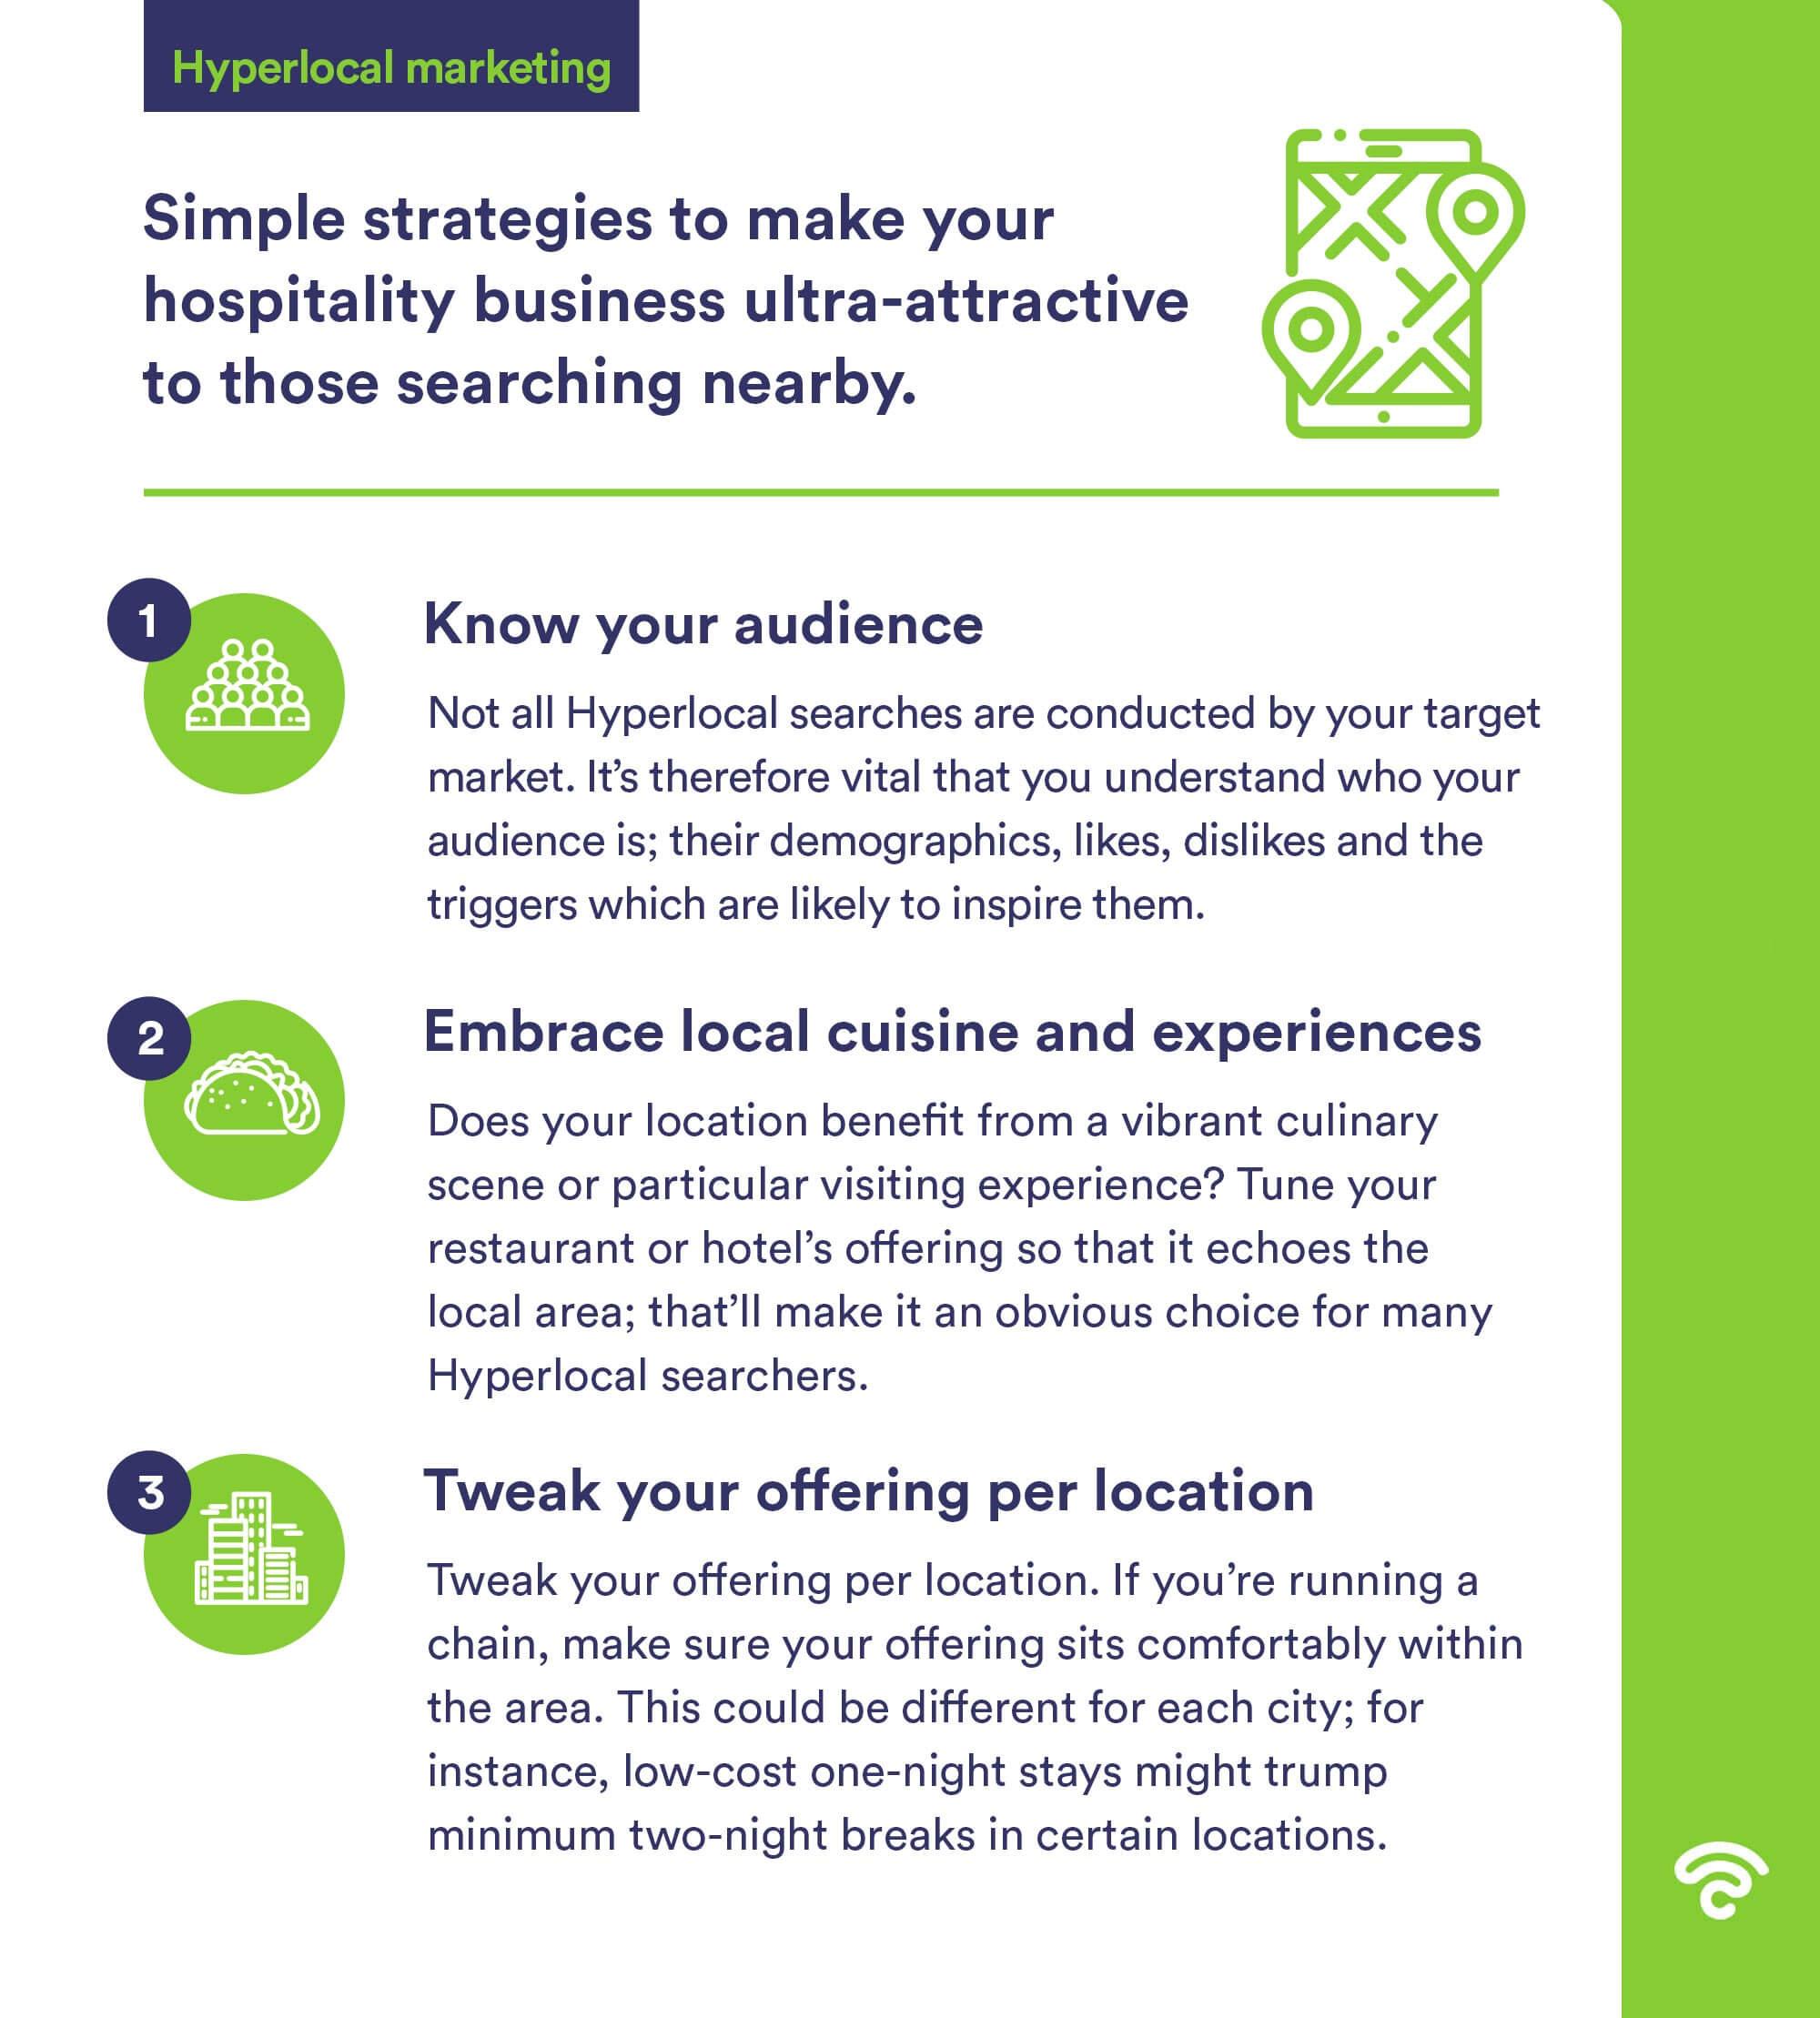 hyperlocal marketing strategies